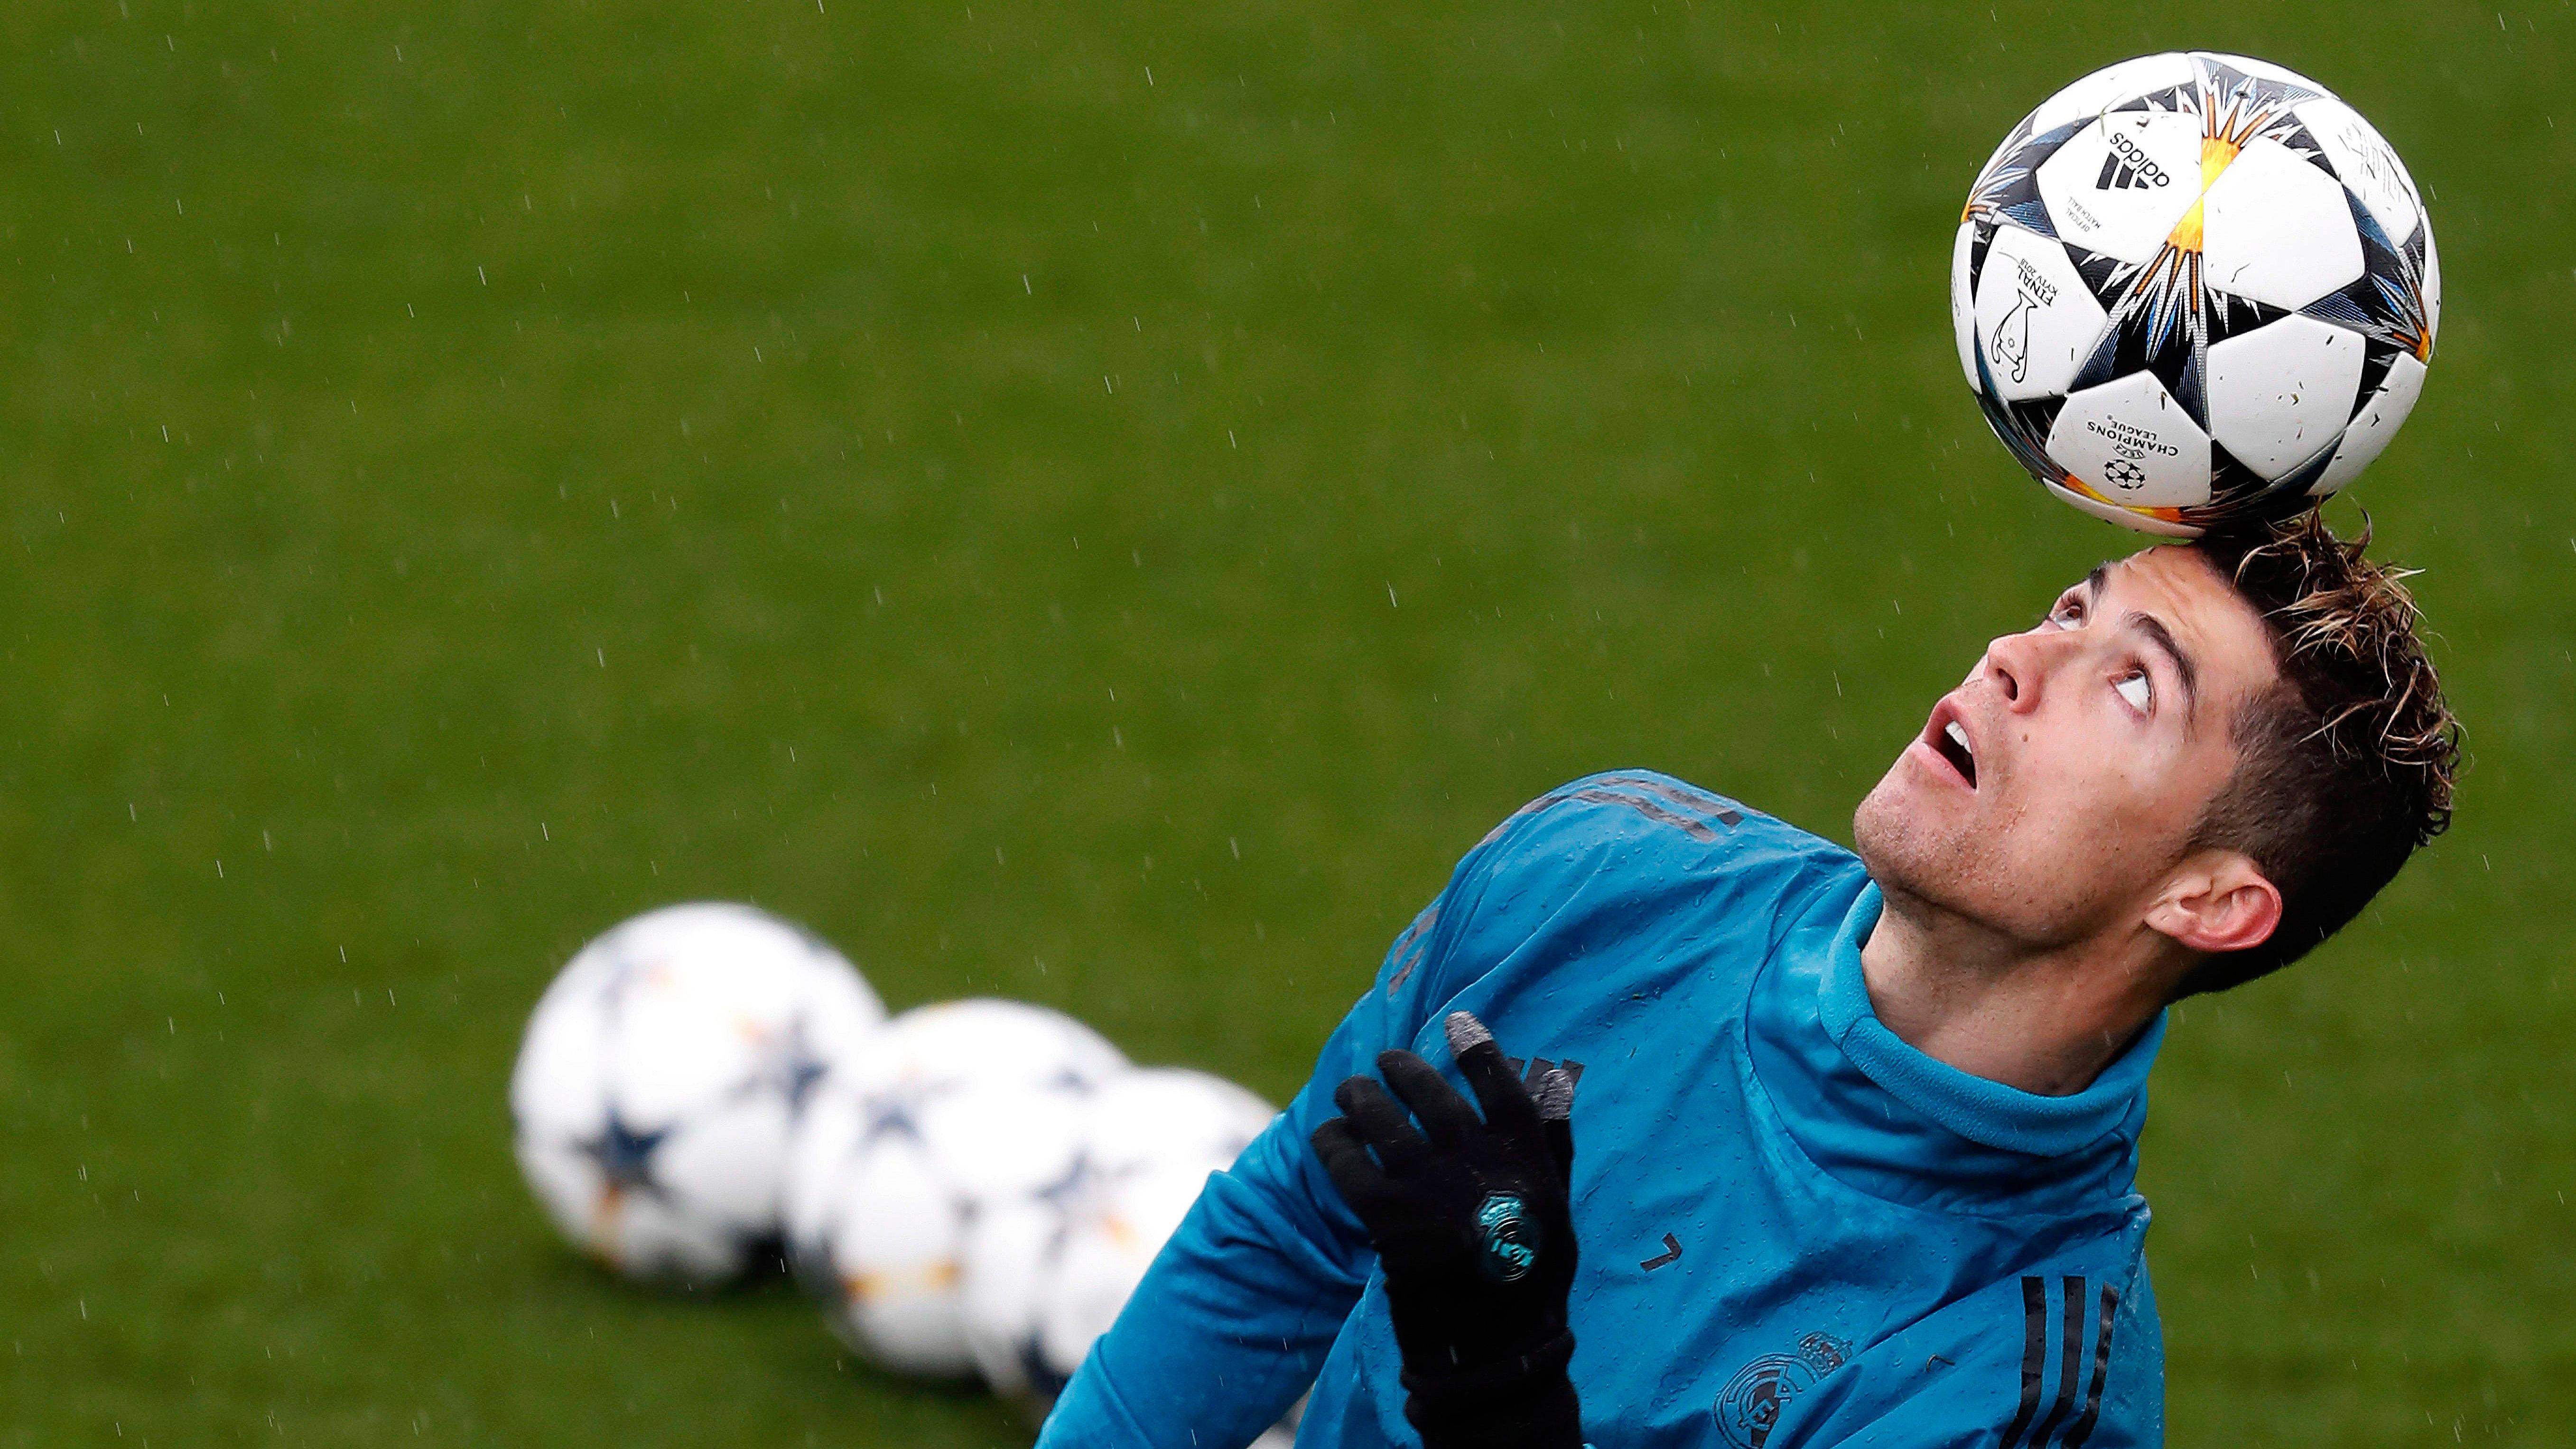 El Madrid recibe a la Juve con la ventaja del 0-3 de la ida